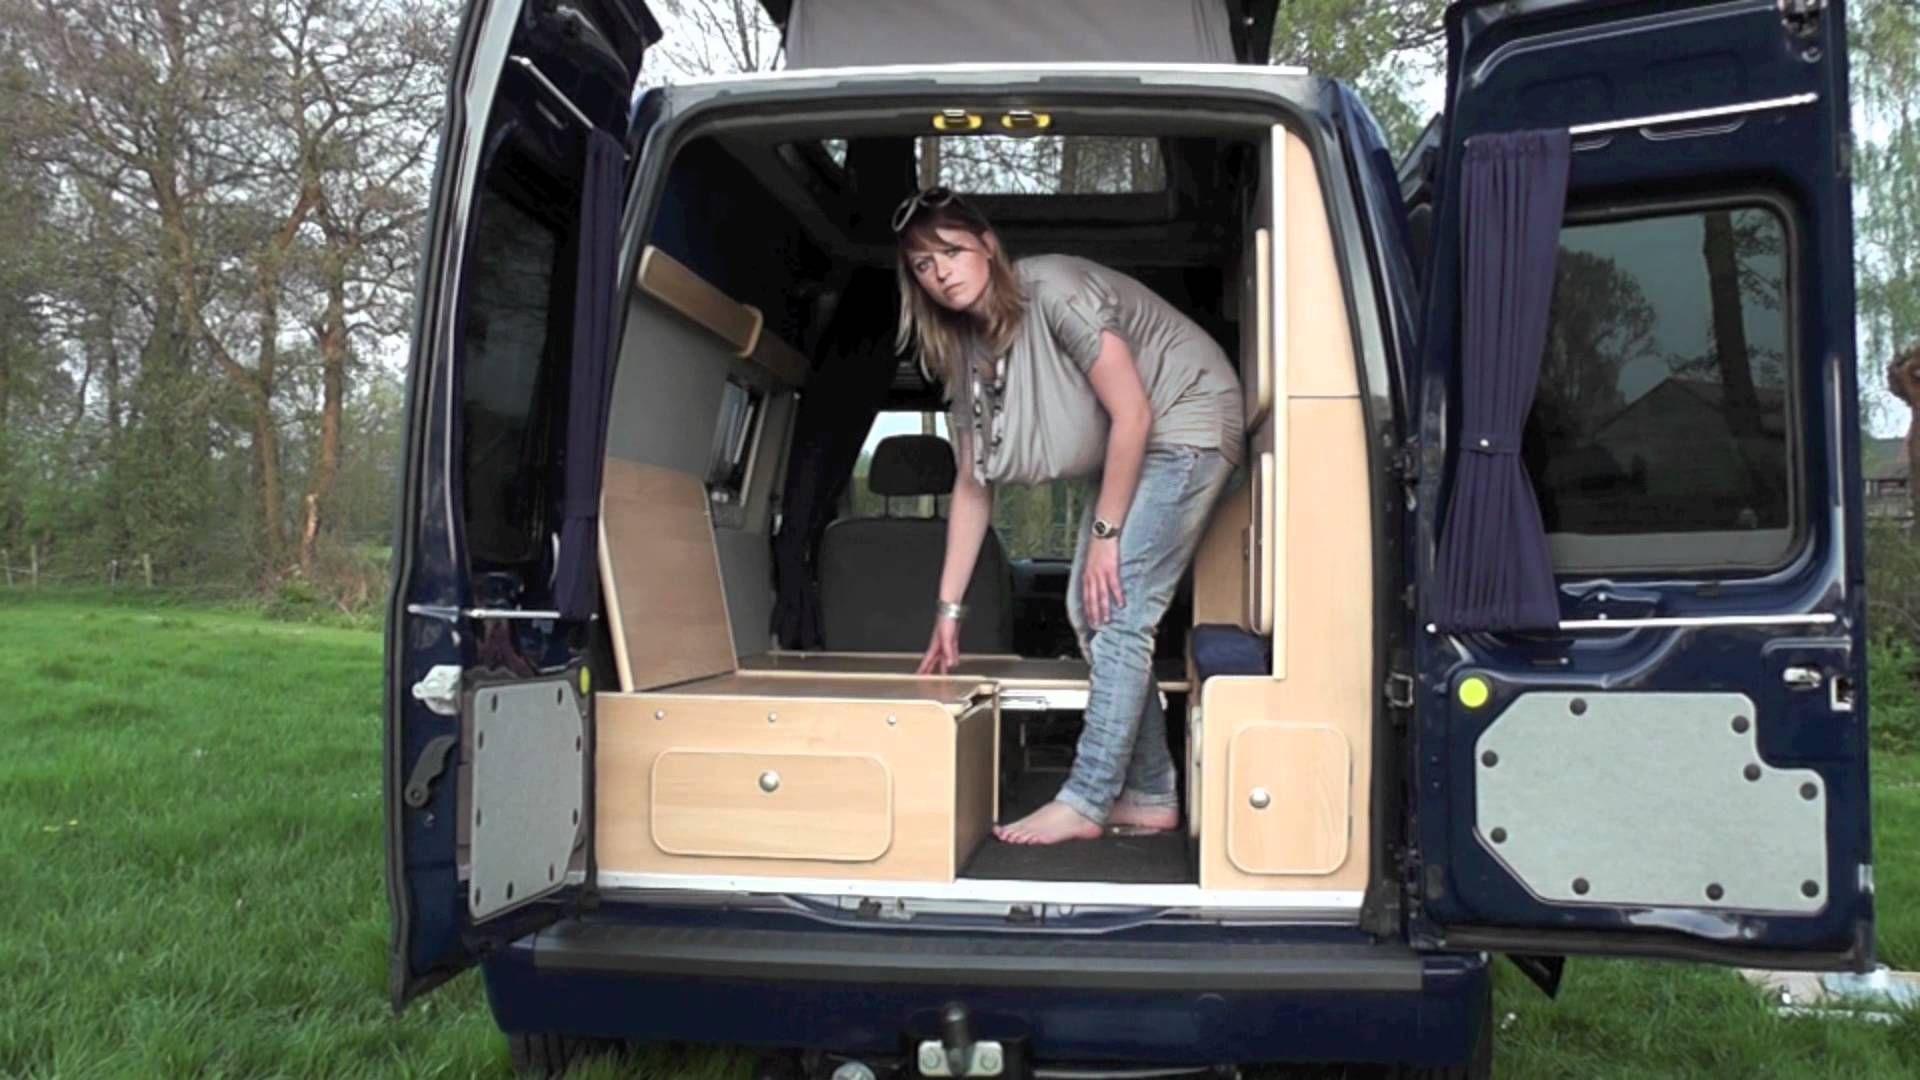 Mercedes Sprinter Kamper >> Demonstration of MiniCamper By JB Kampeerauto's | Travel | Pinterest | Camper conversion ...